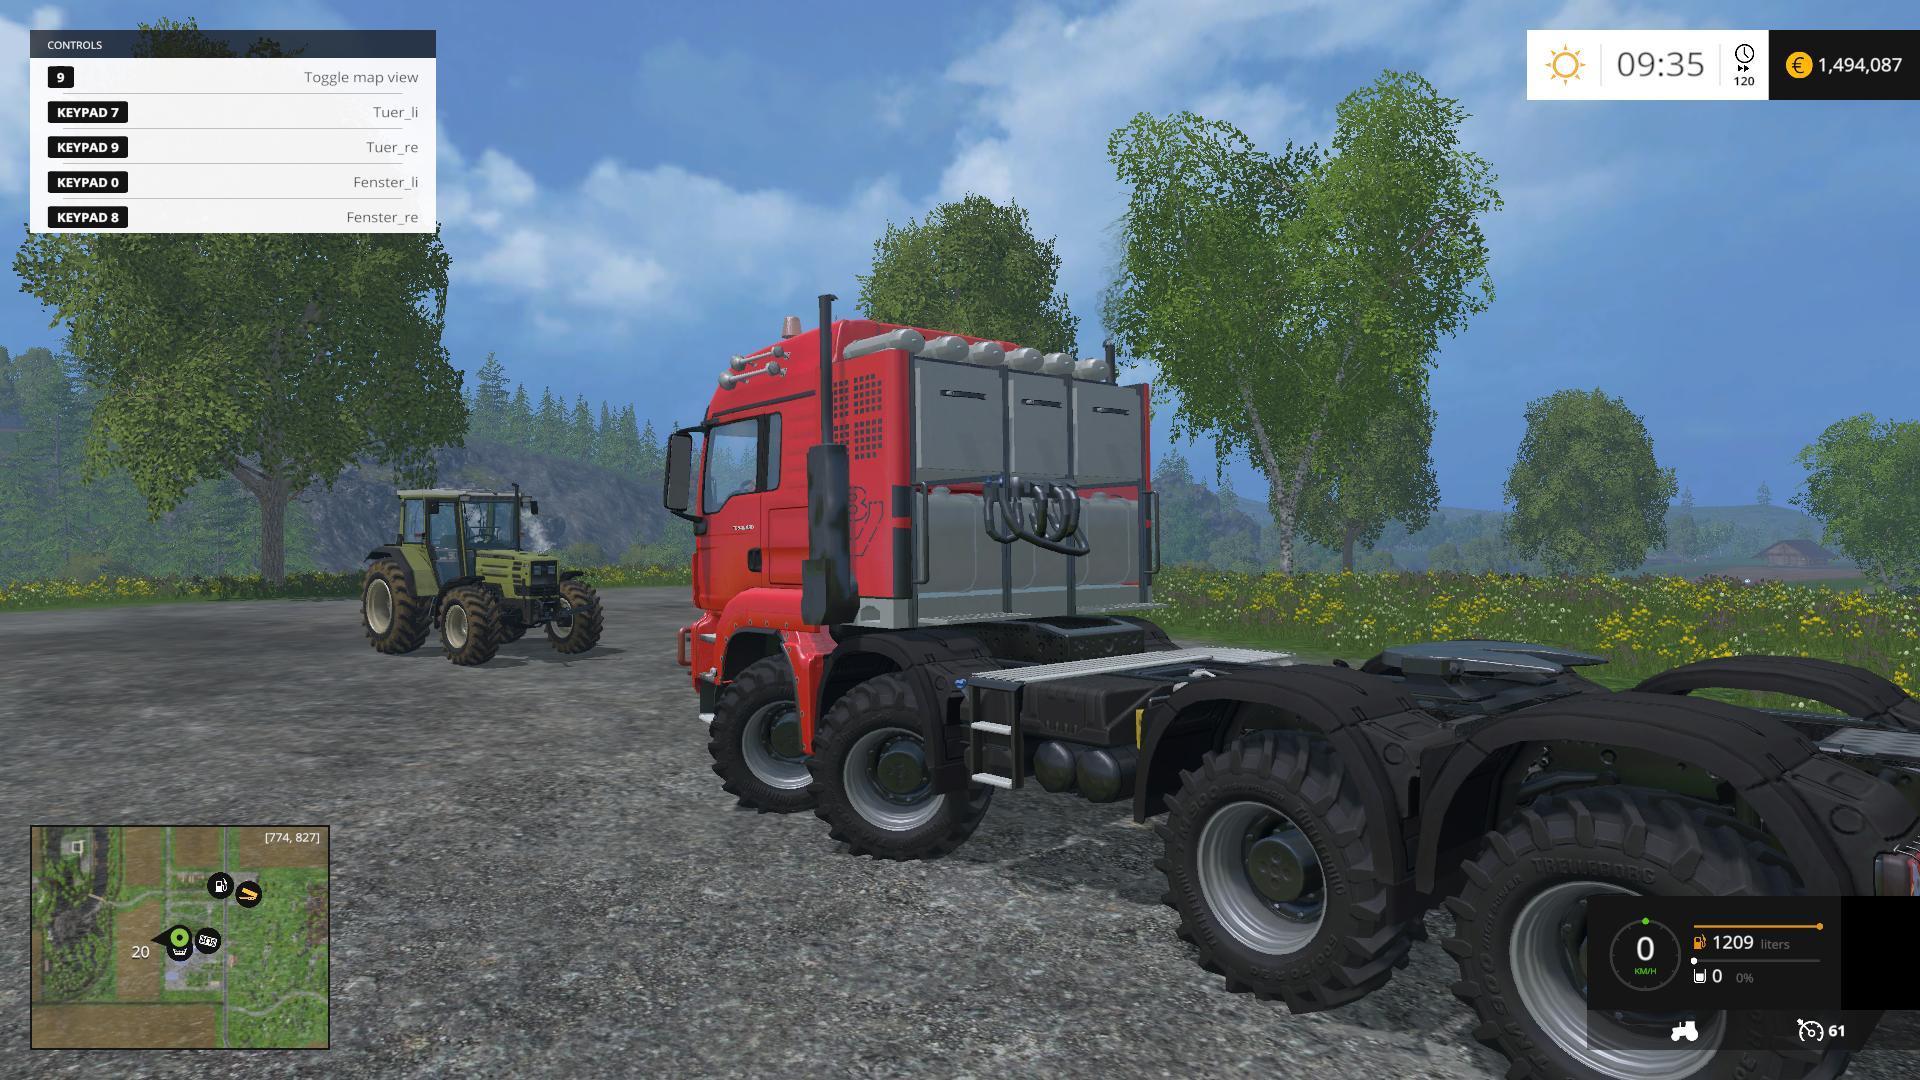 MAN TGS 8X8 TRUCK V5 5 - Farming simulator 19 / 17 / 15 Mod